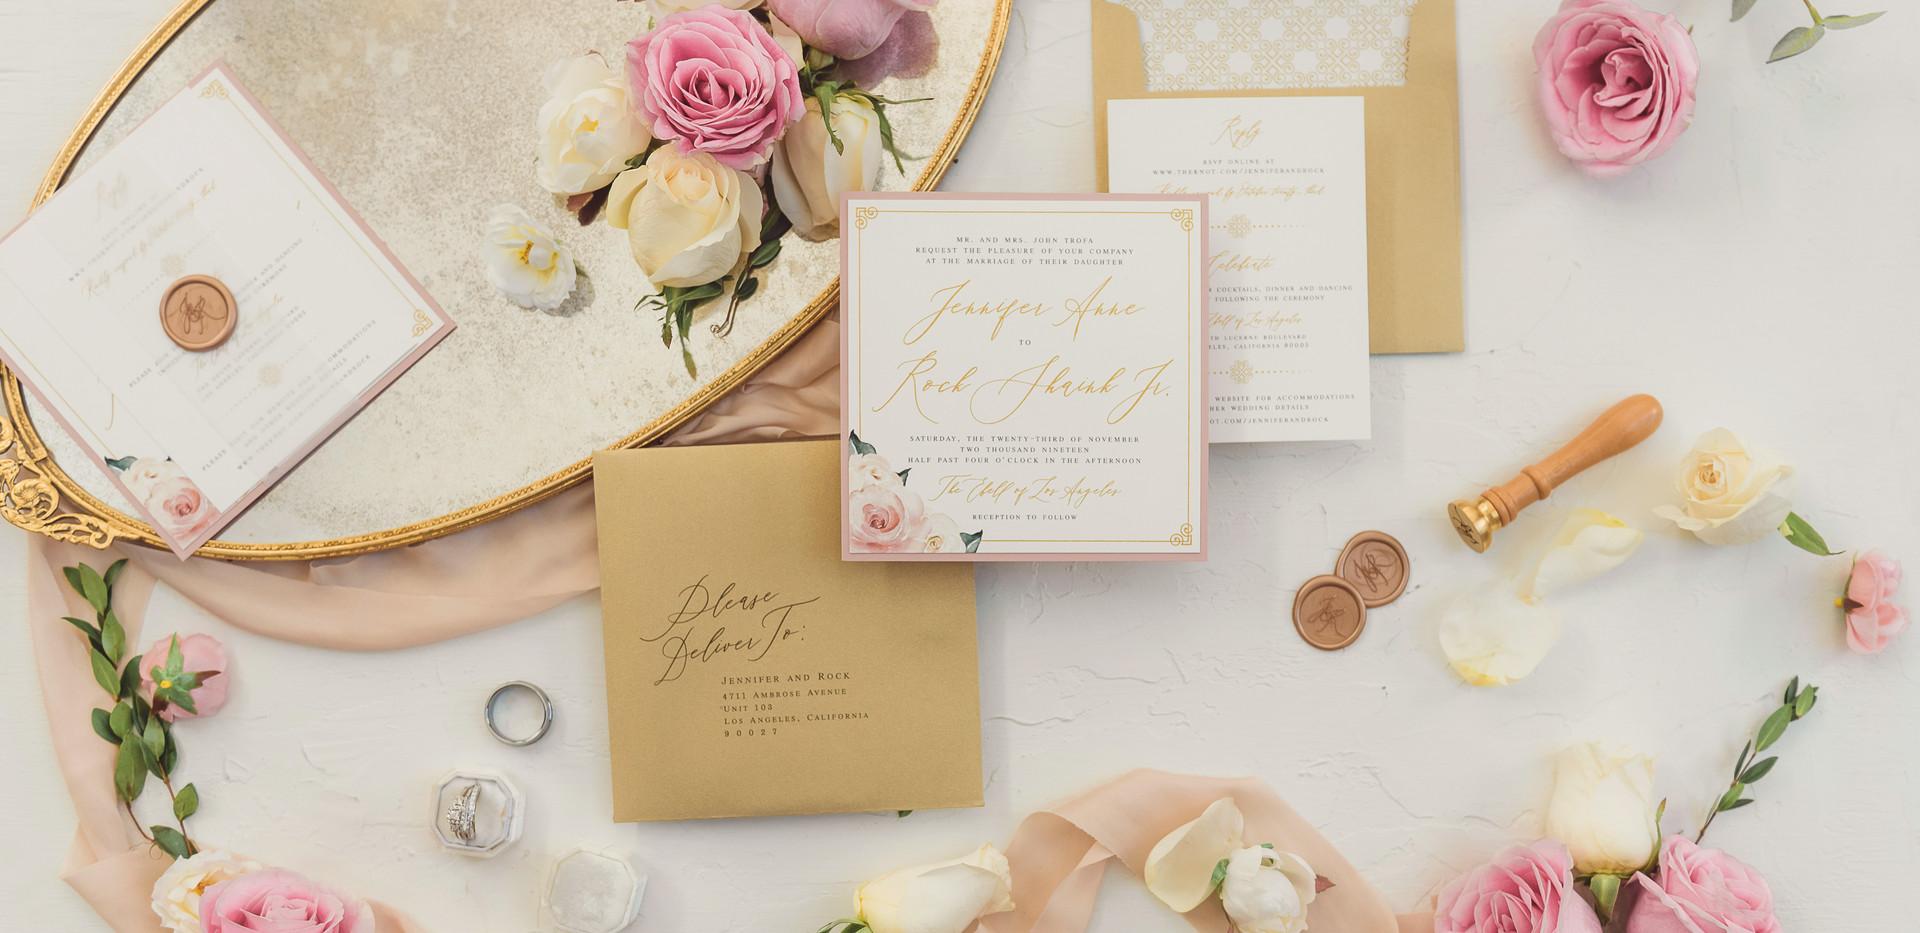 Classic Blush and White Wedding Invitations